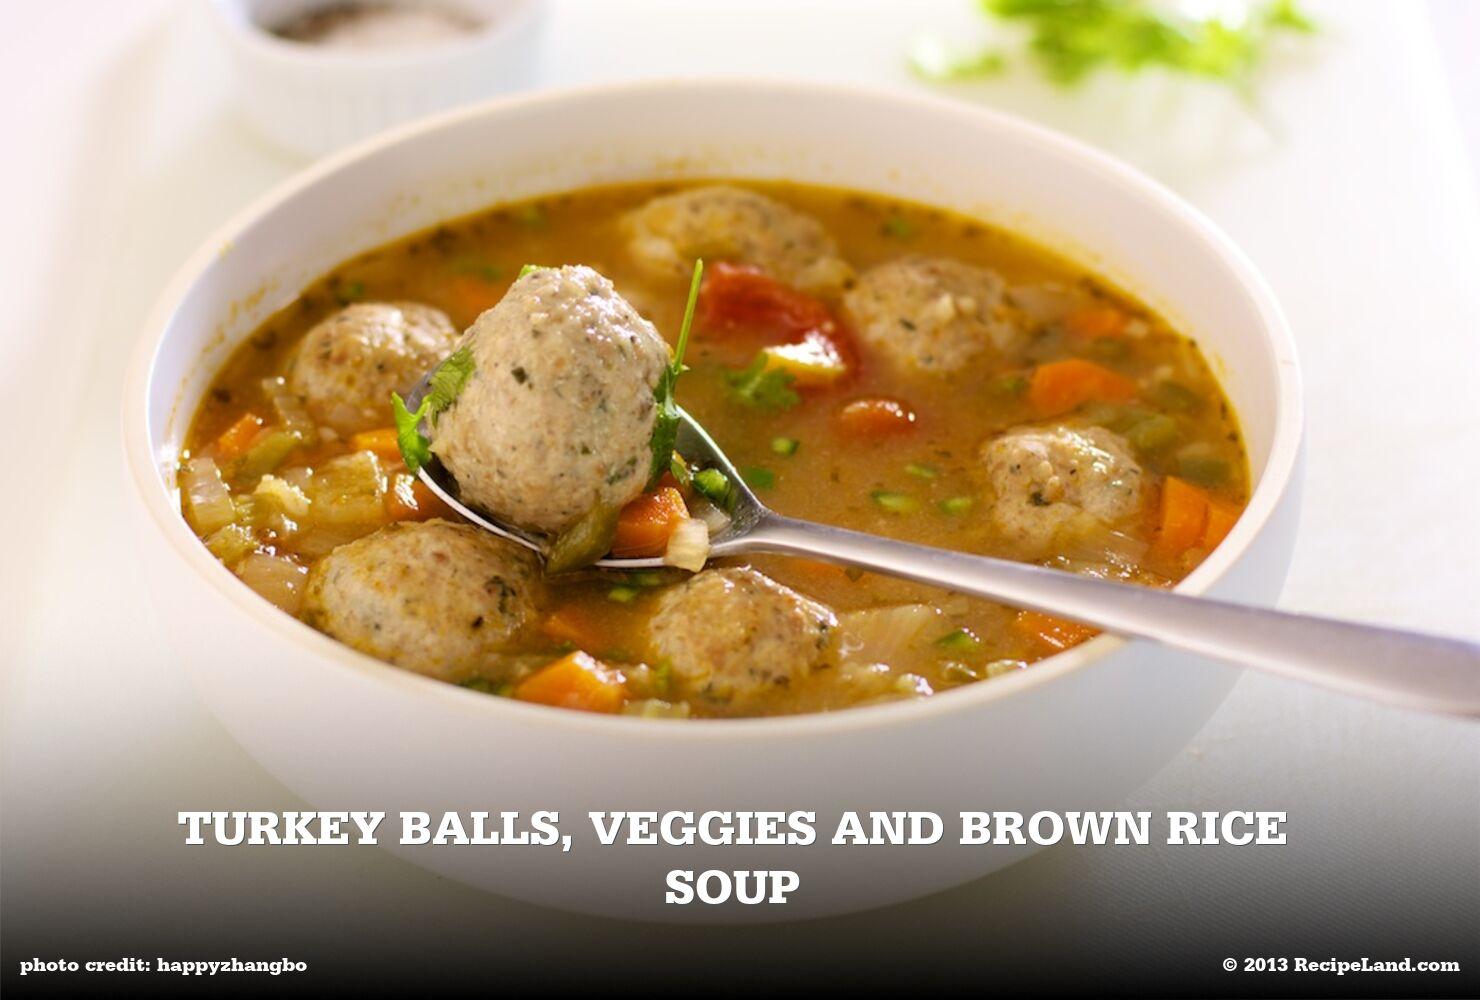 Turkey Balls, Veggies and Brown Rice Soup